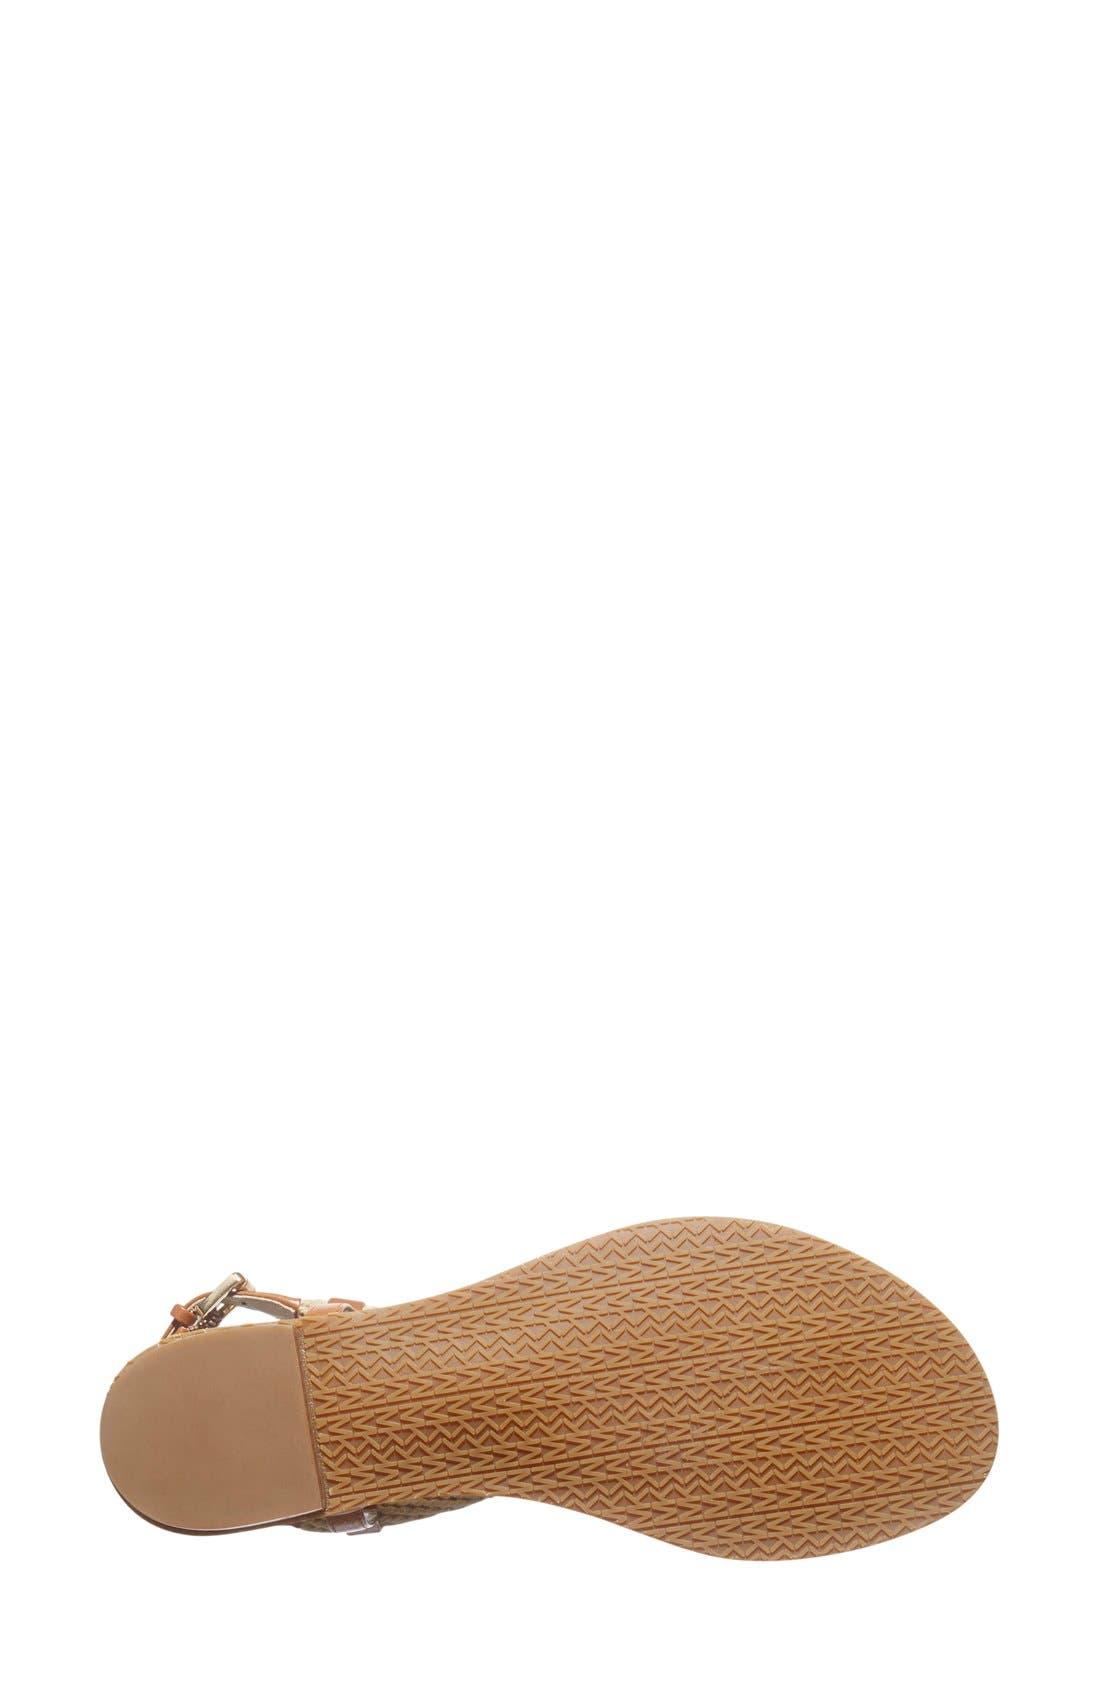 Alternate Image 4  - MICHAEL Michael Kors 'Holly' Leather Thong Sandal (Women)